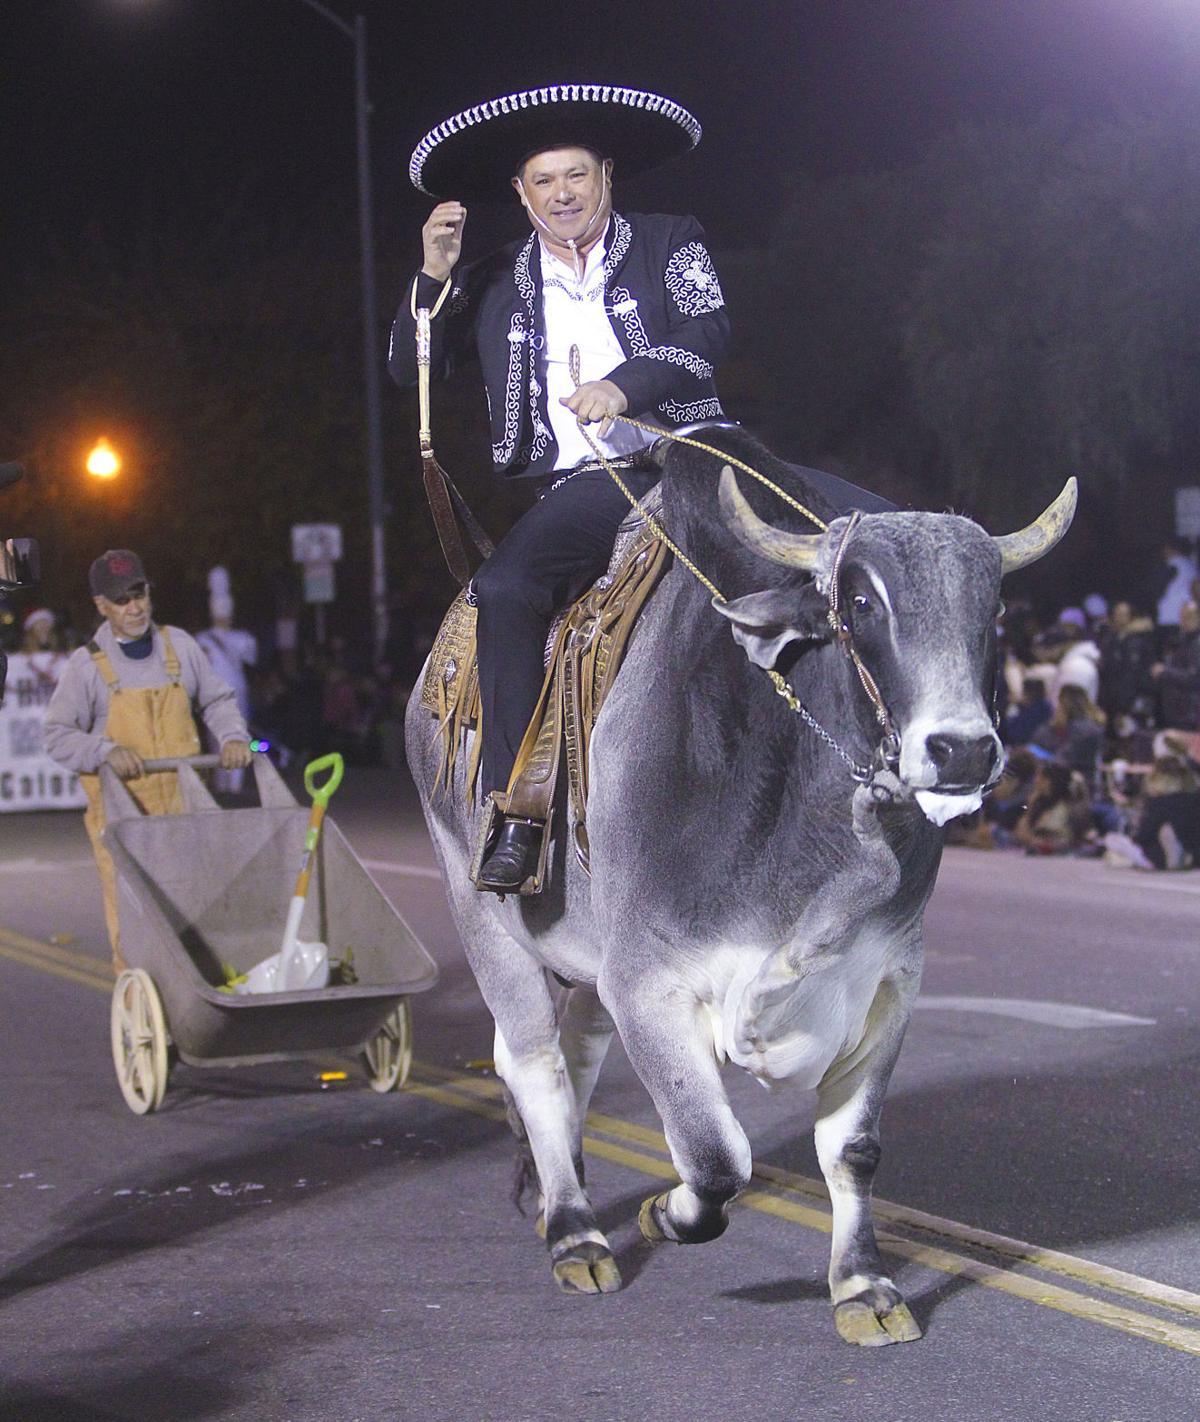 Christmas Parade kicks the holiday season into high gear